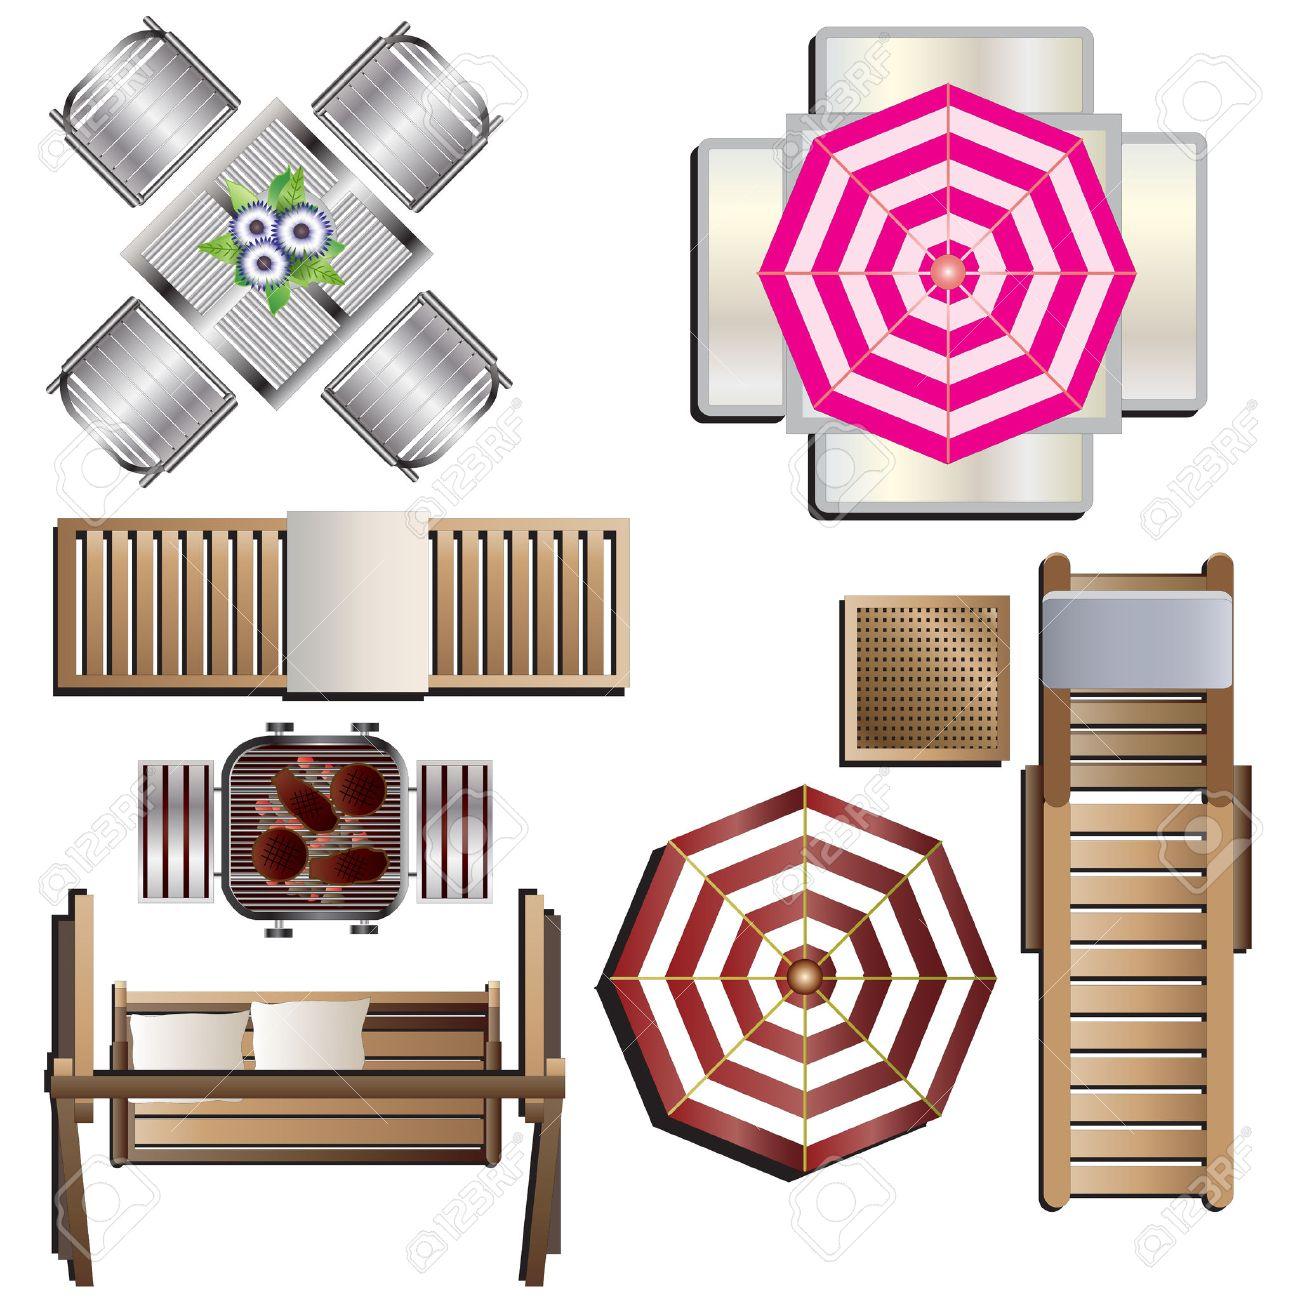 Outdoor Furniture Top View Set 18 For Landscape Design Vector Illustration Stock